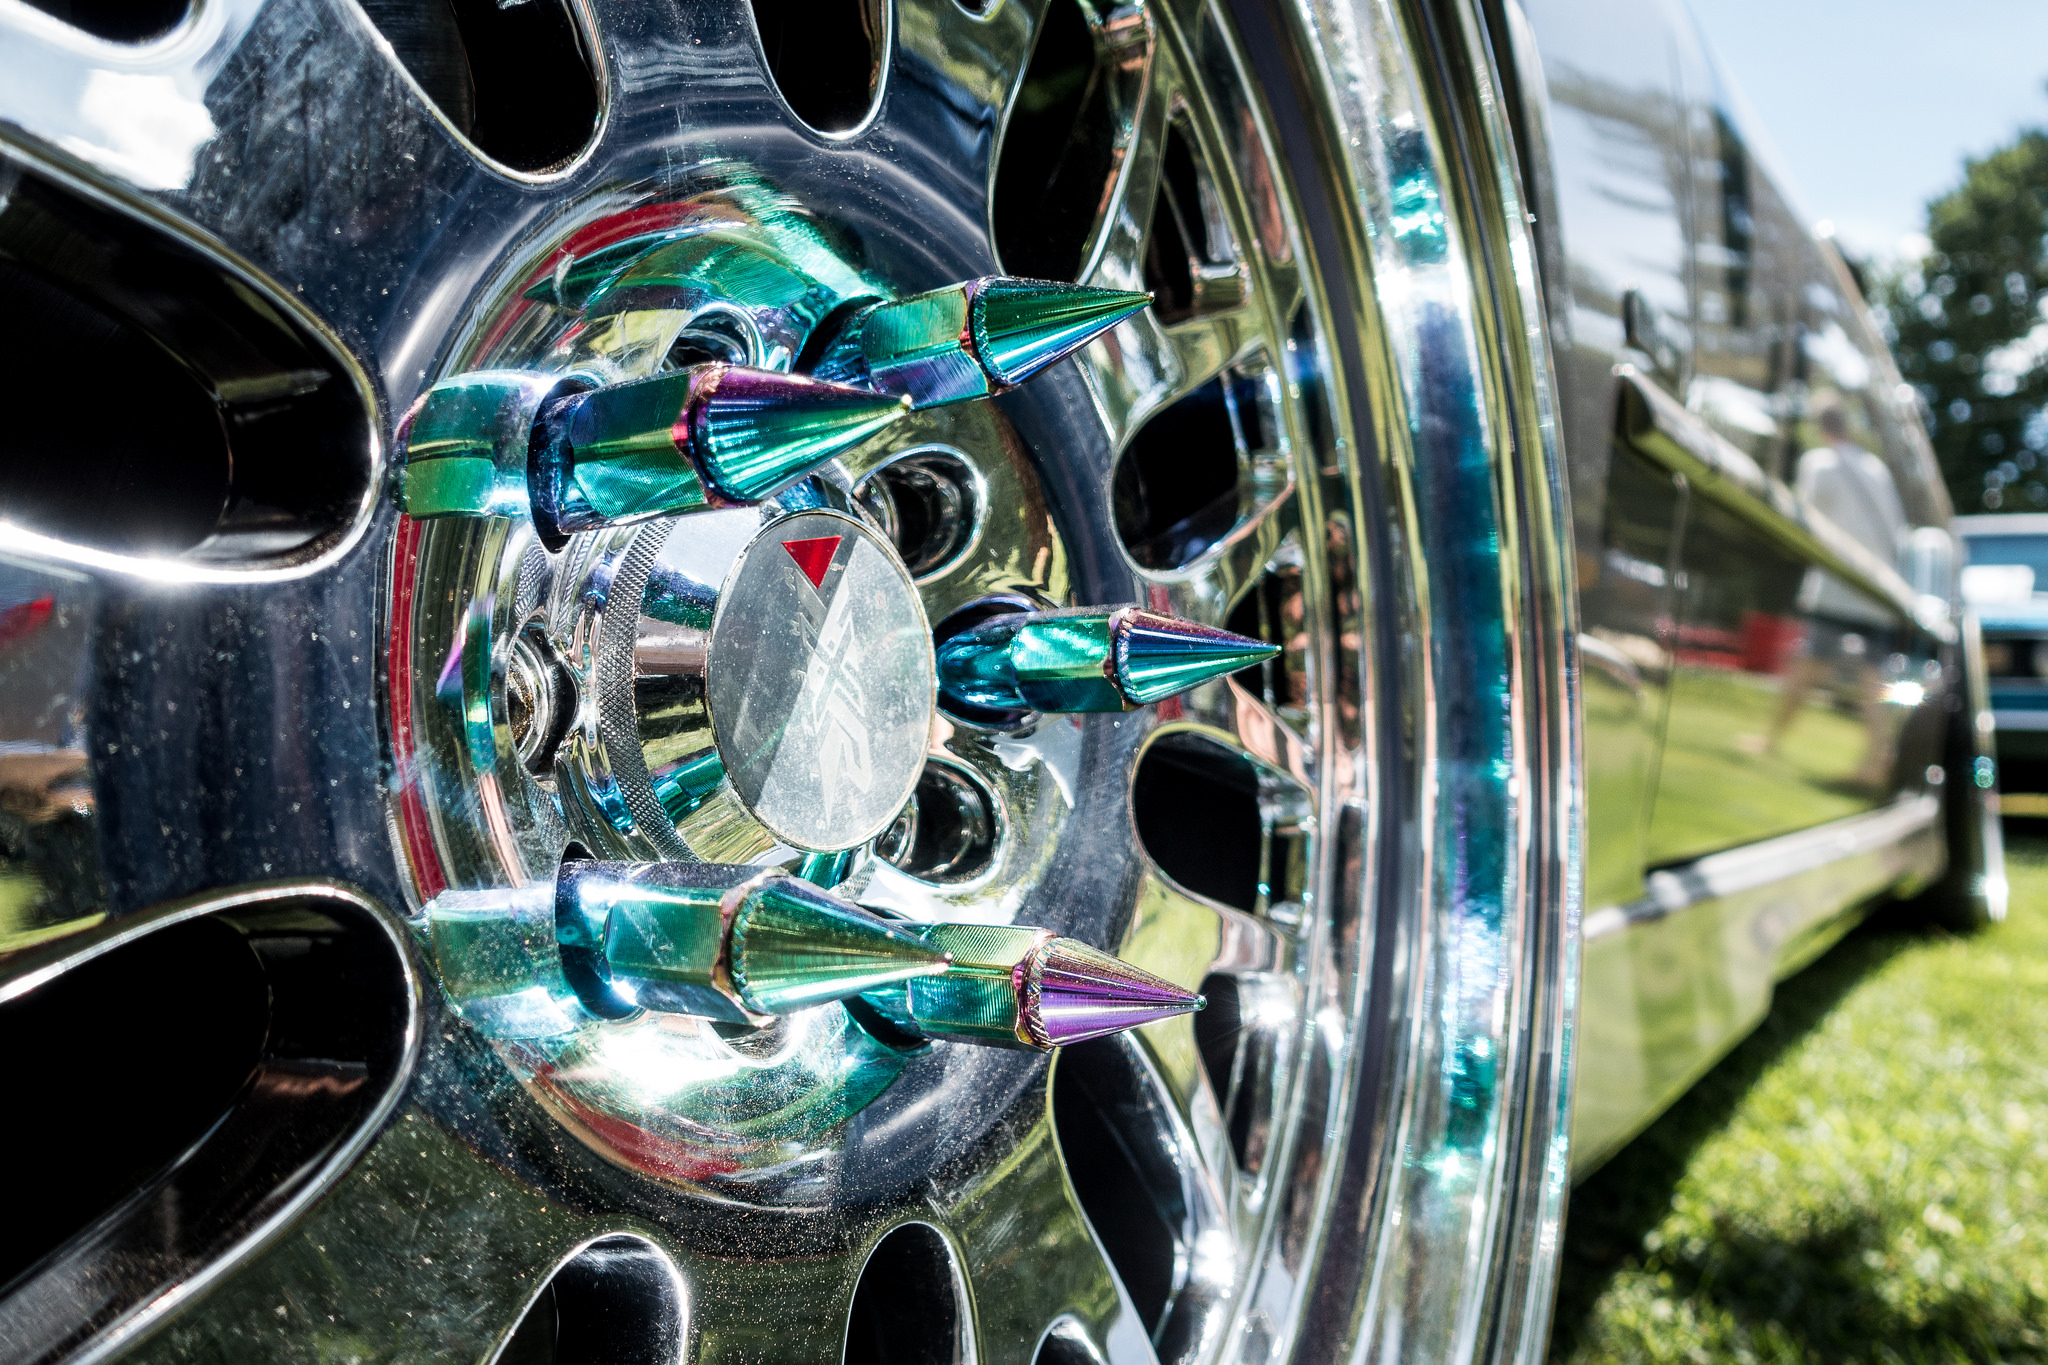 Semi Truck Hubcap Spikes Decorative Or Dangerous The